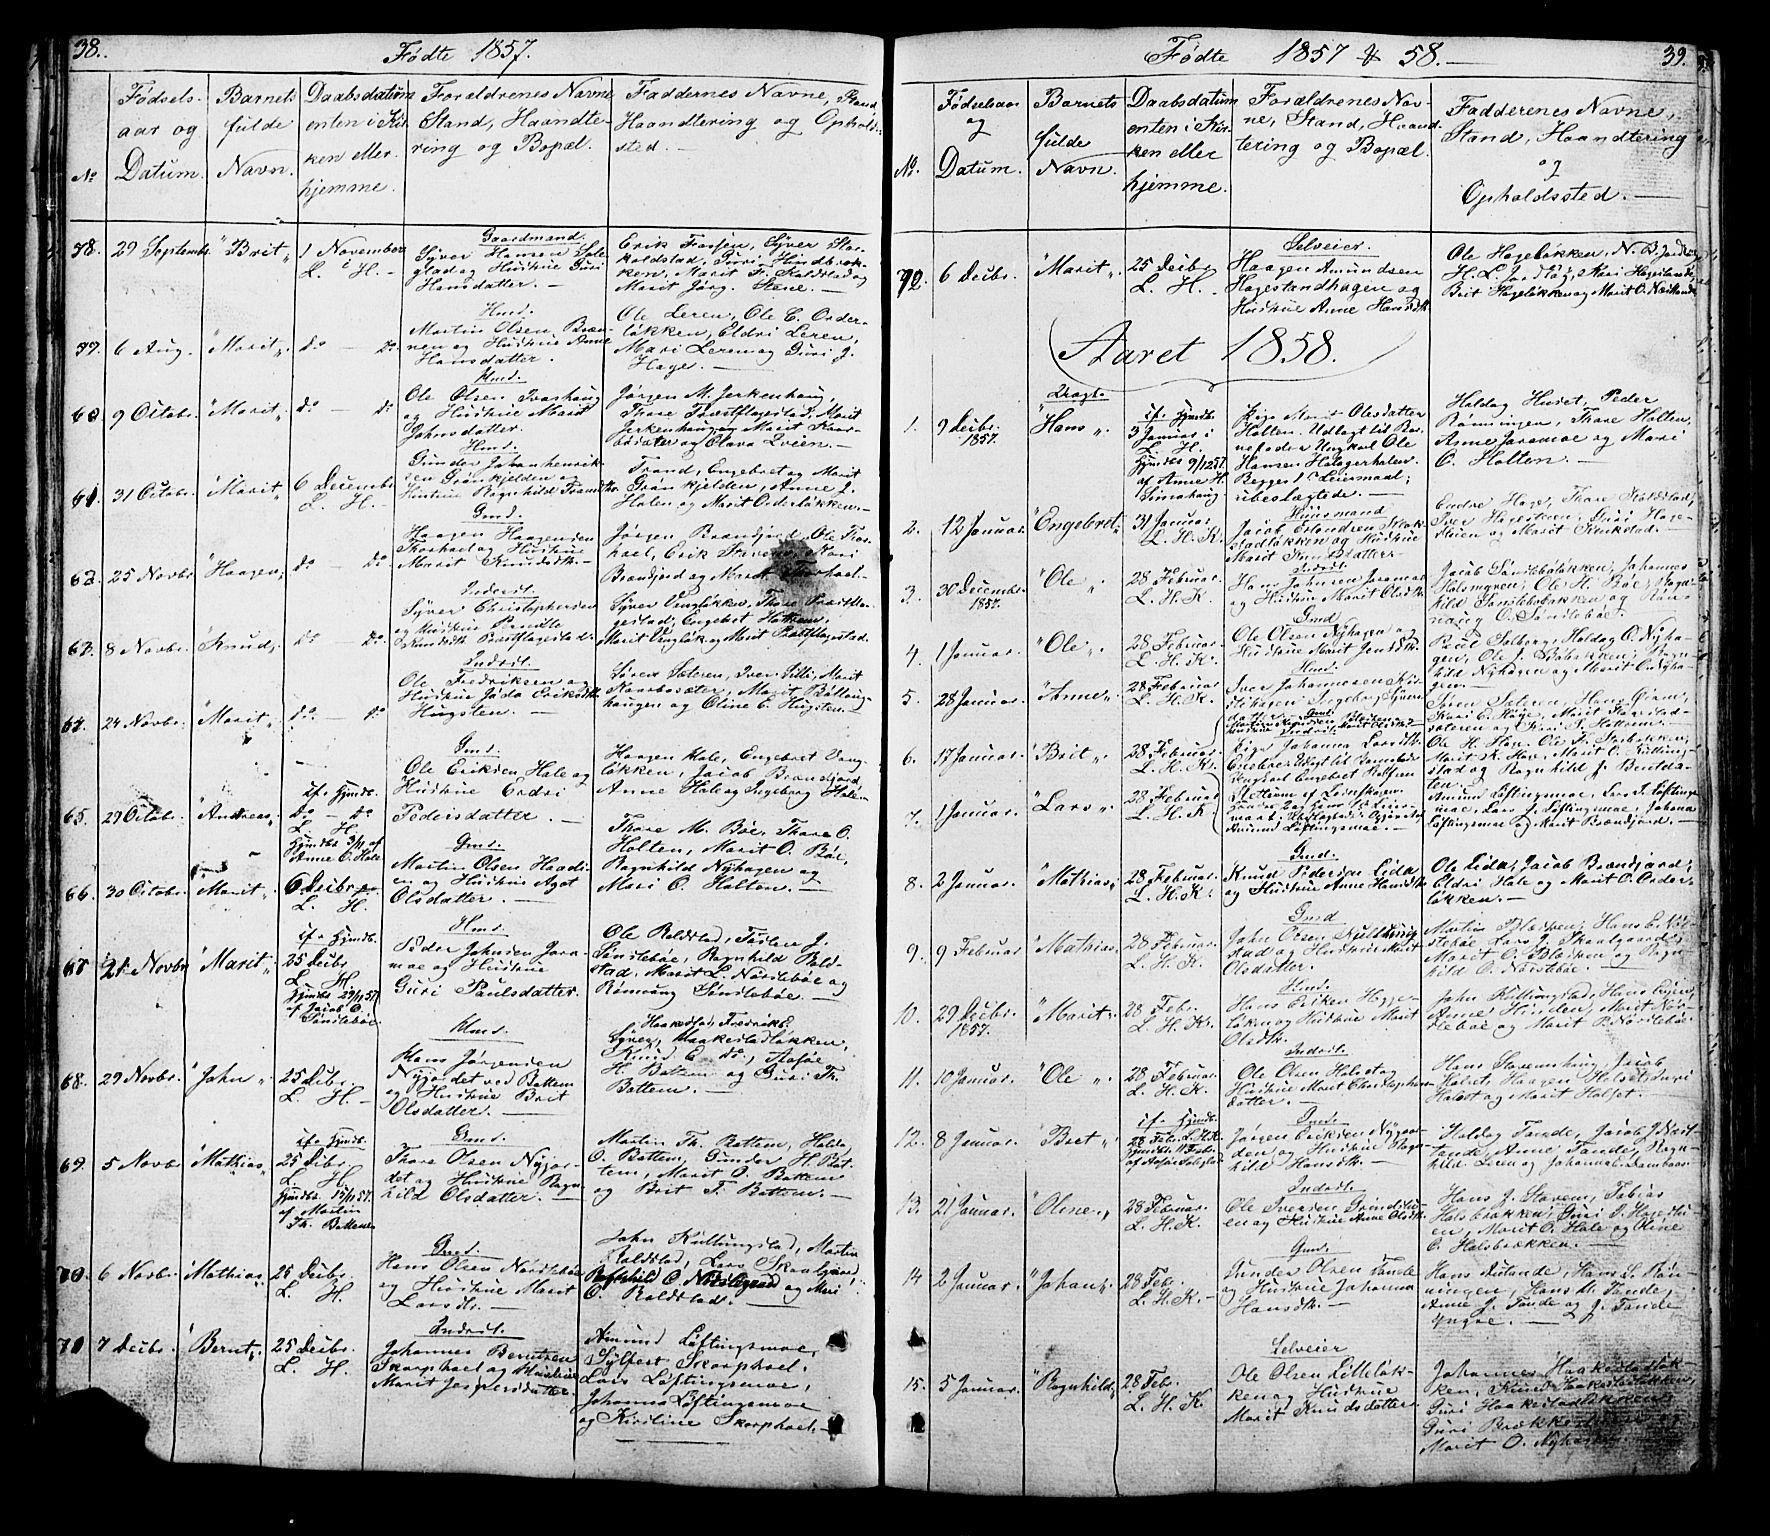 SAH, Lesja prestekontor, Klokkerbok nr. 5, 1850-1894, s. 38-39